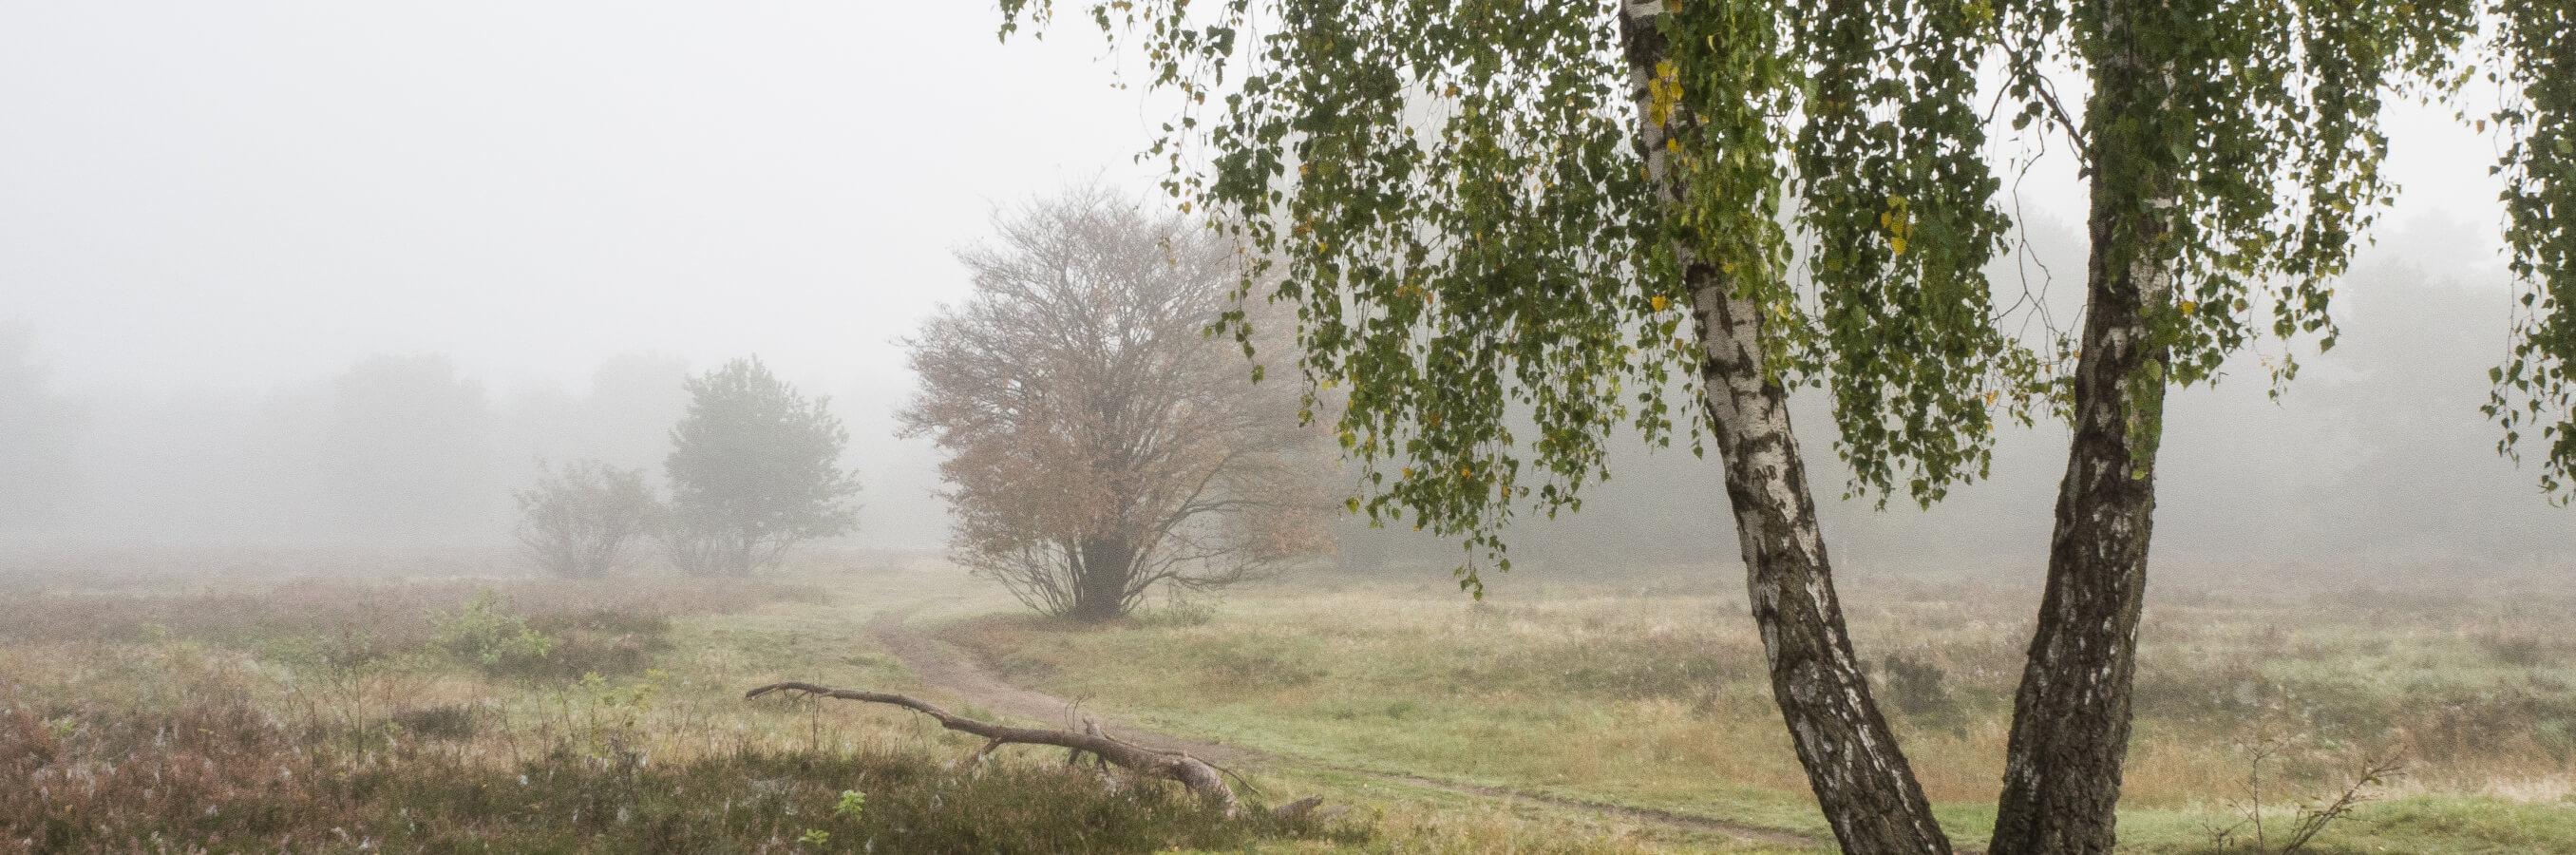 Bussum heide mist nabij locatie mindfulness training